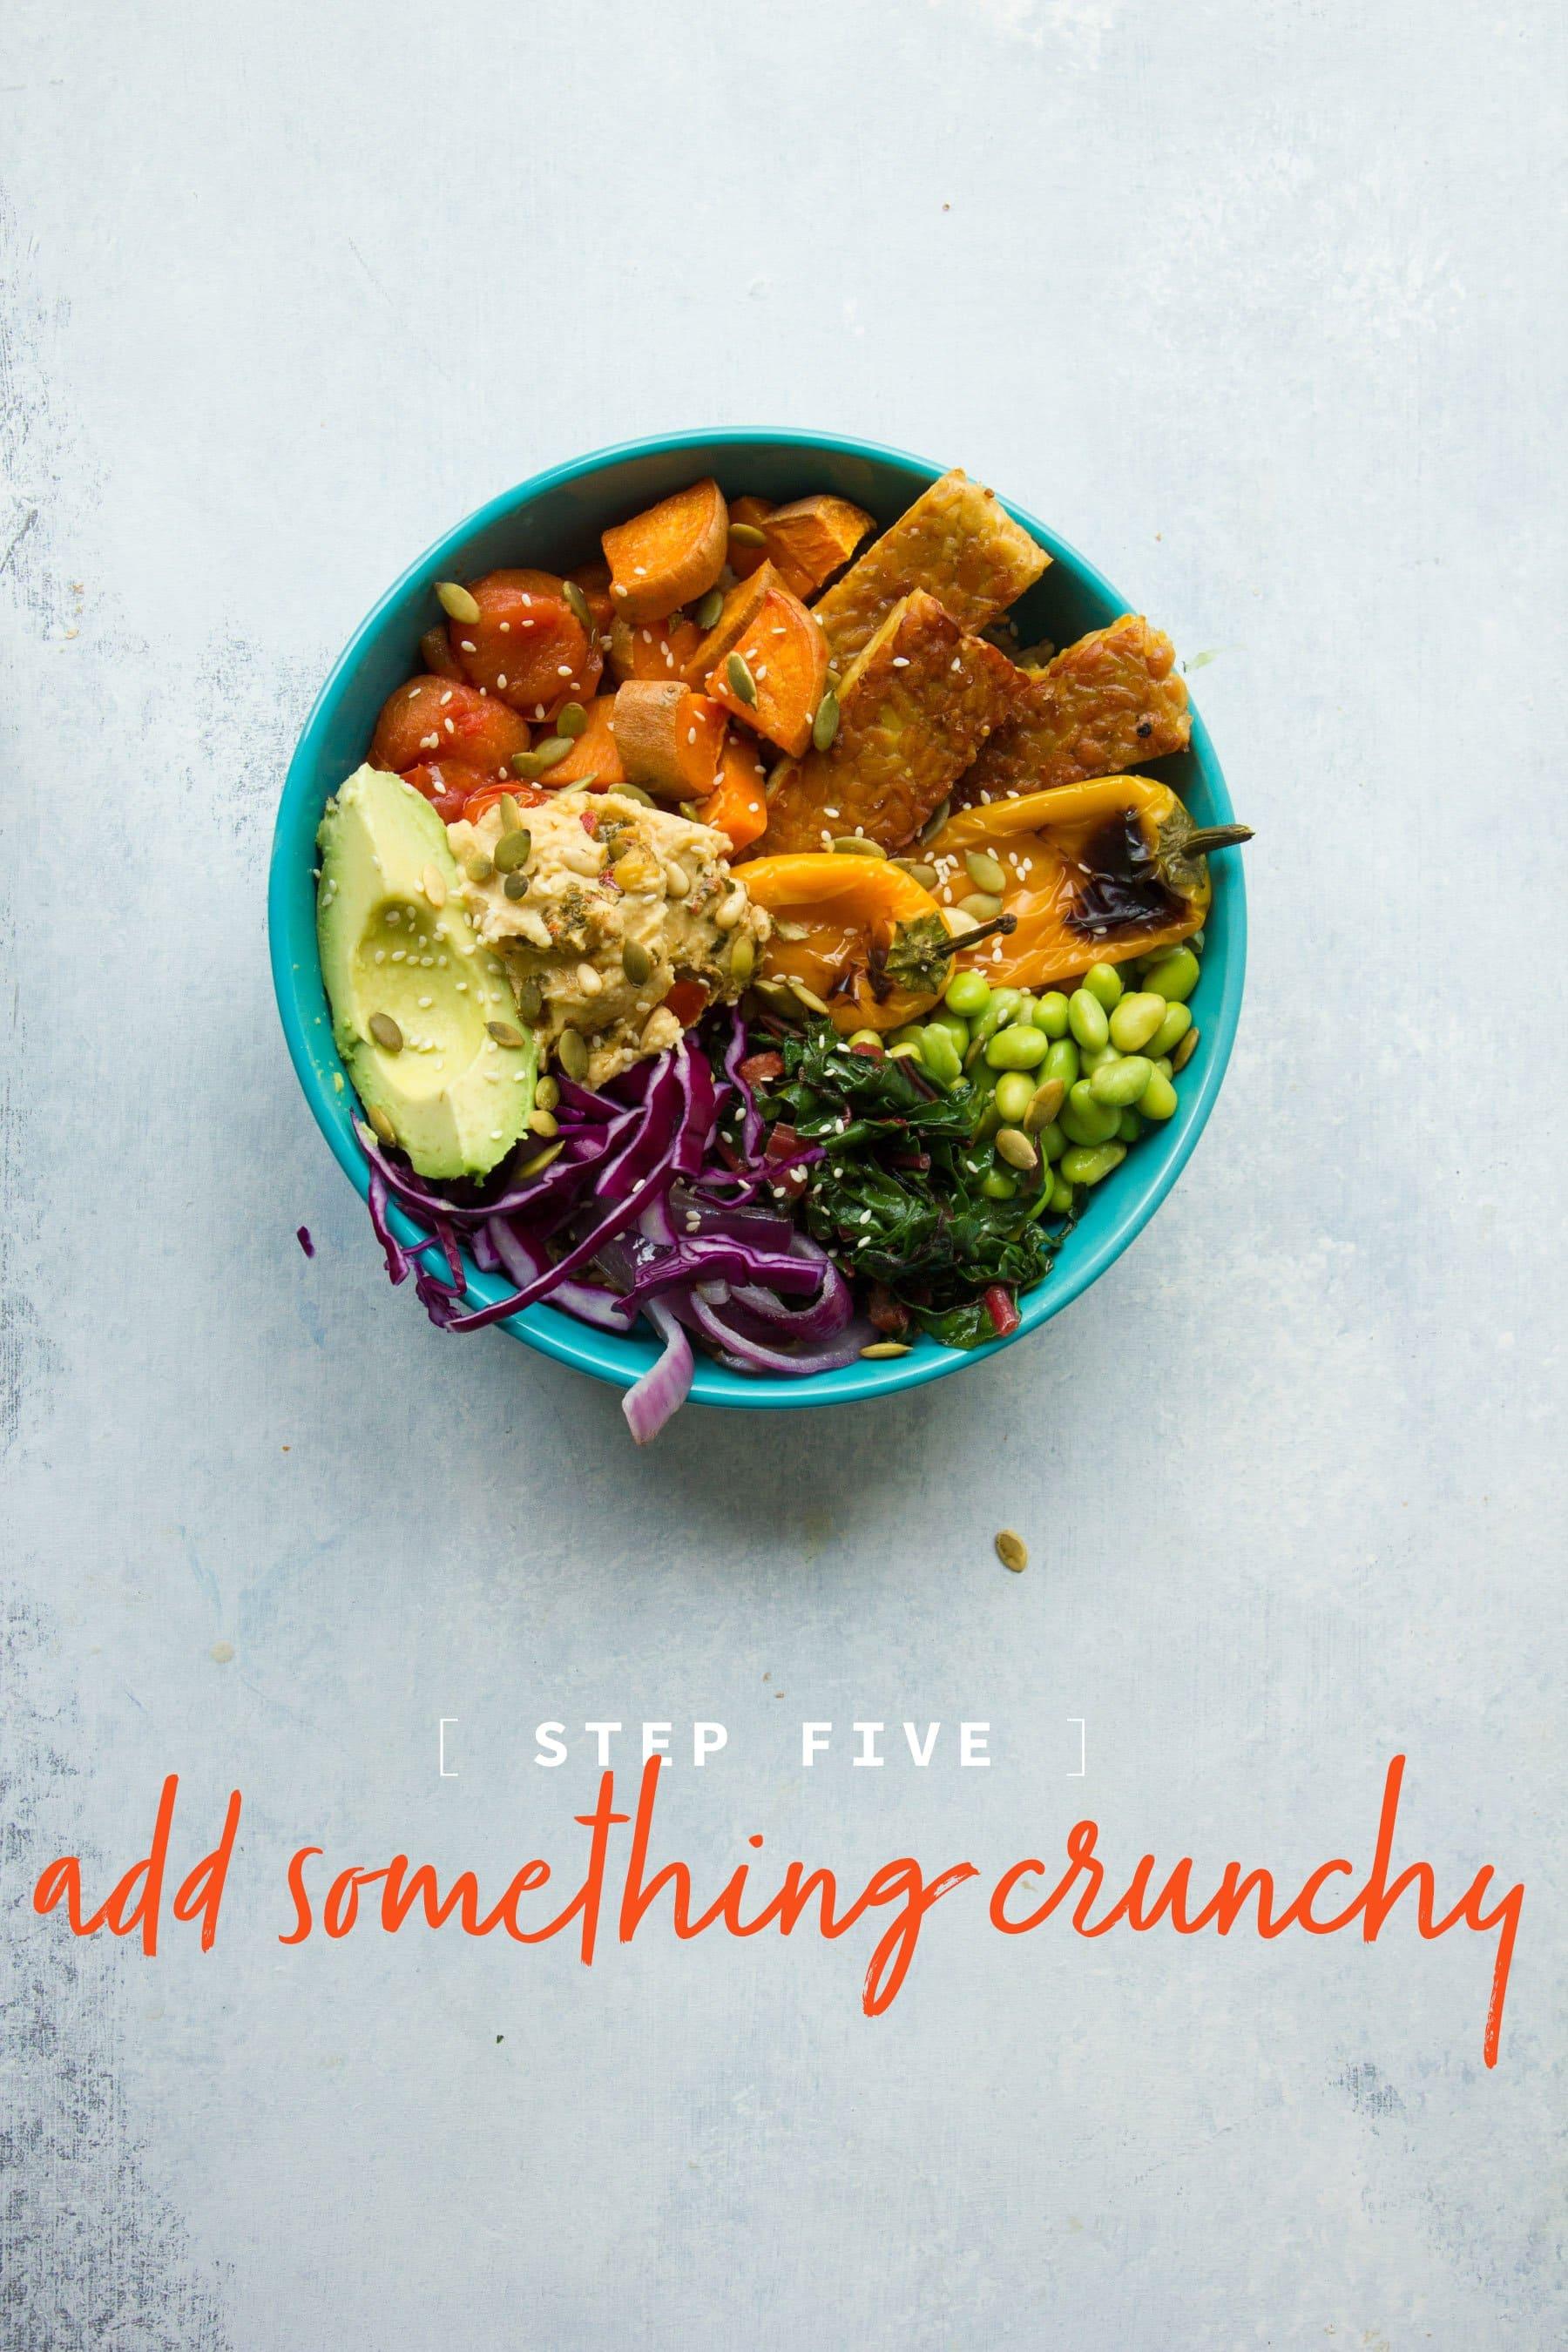 Step Five: Add Something Crunchy